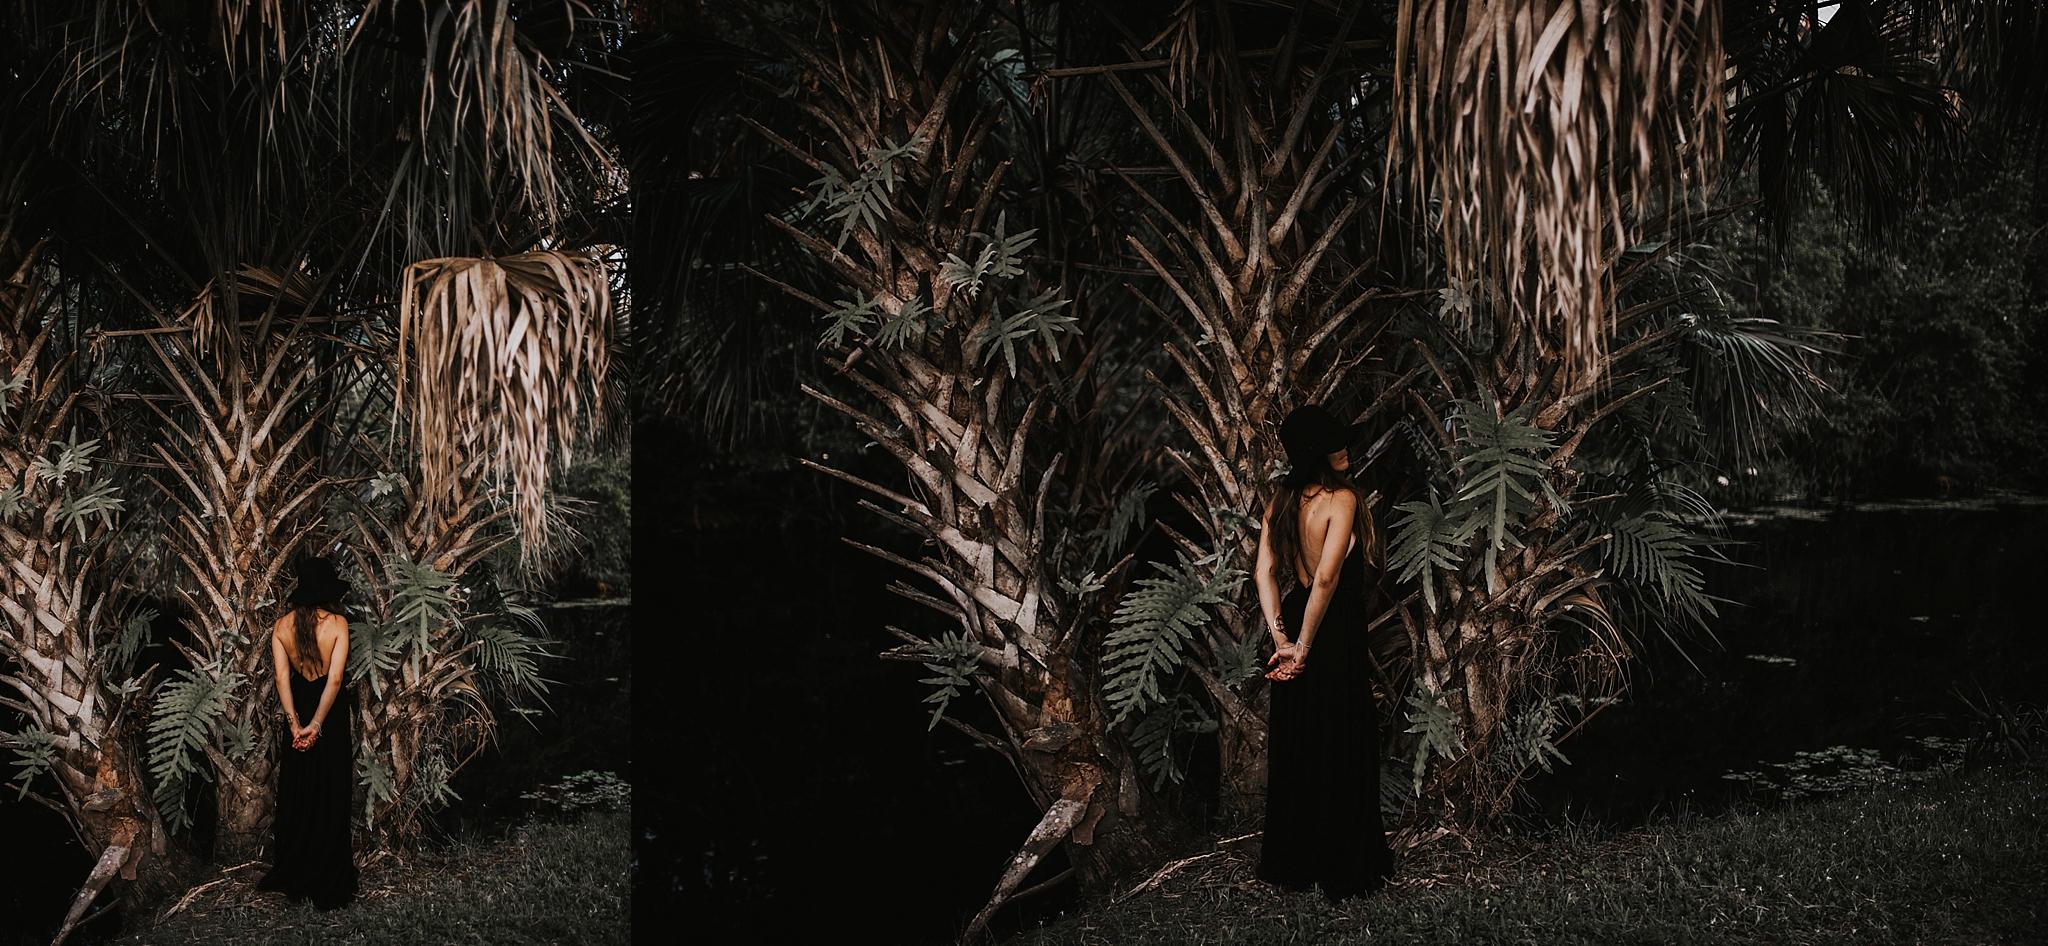 twyla jones photography - treasure coast - florida family photography riverbend park jupiter florida-6253.jpg